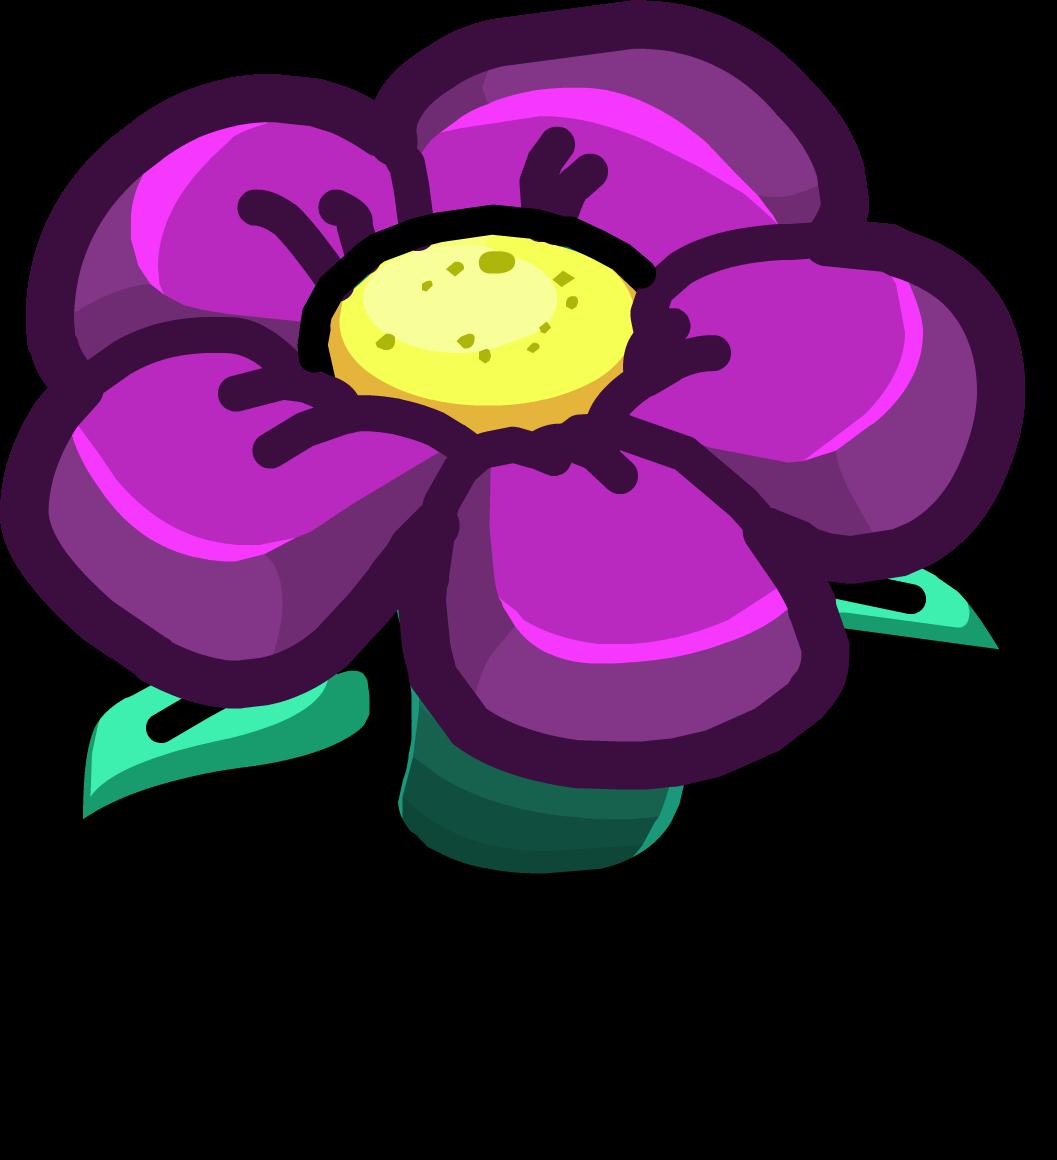 Výsledek obrázku pro violet flower sprite png